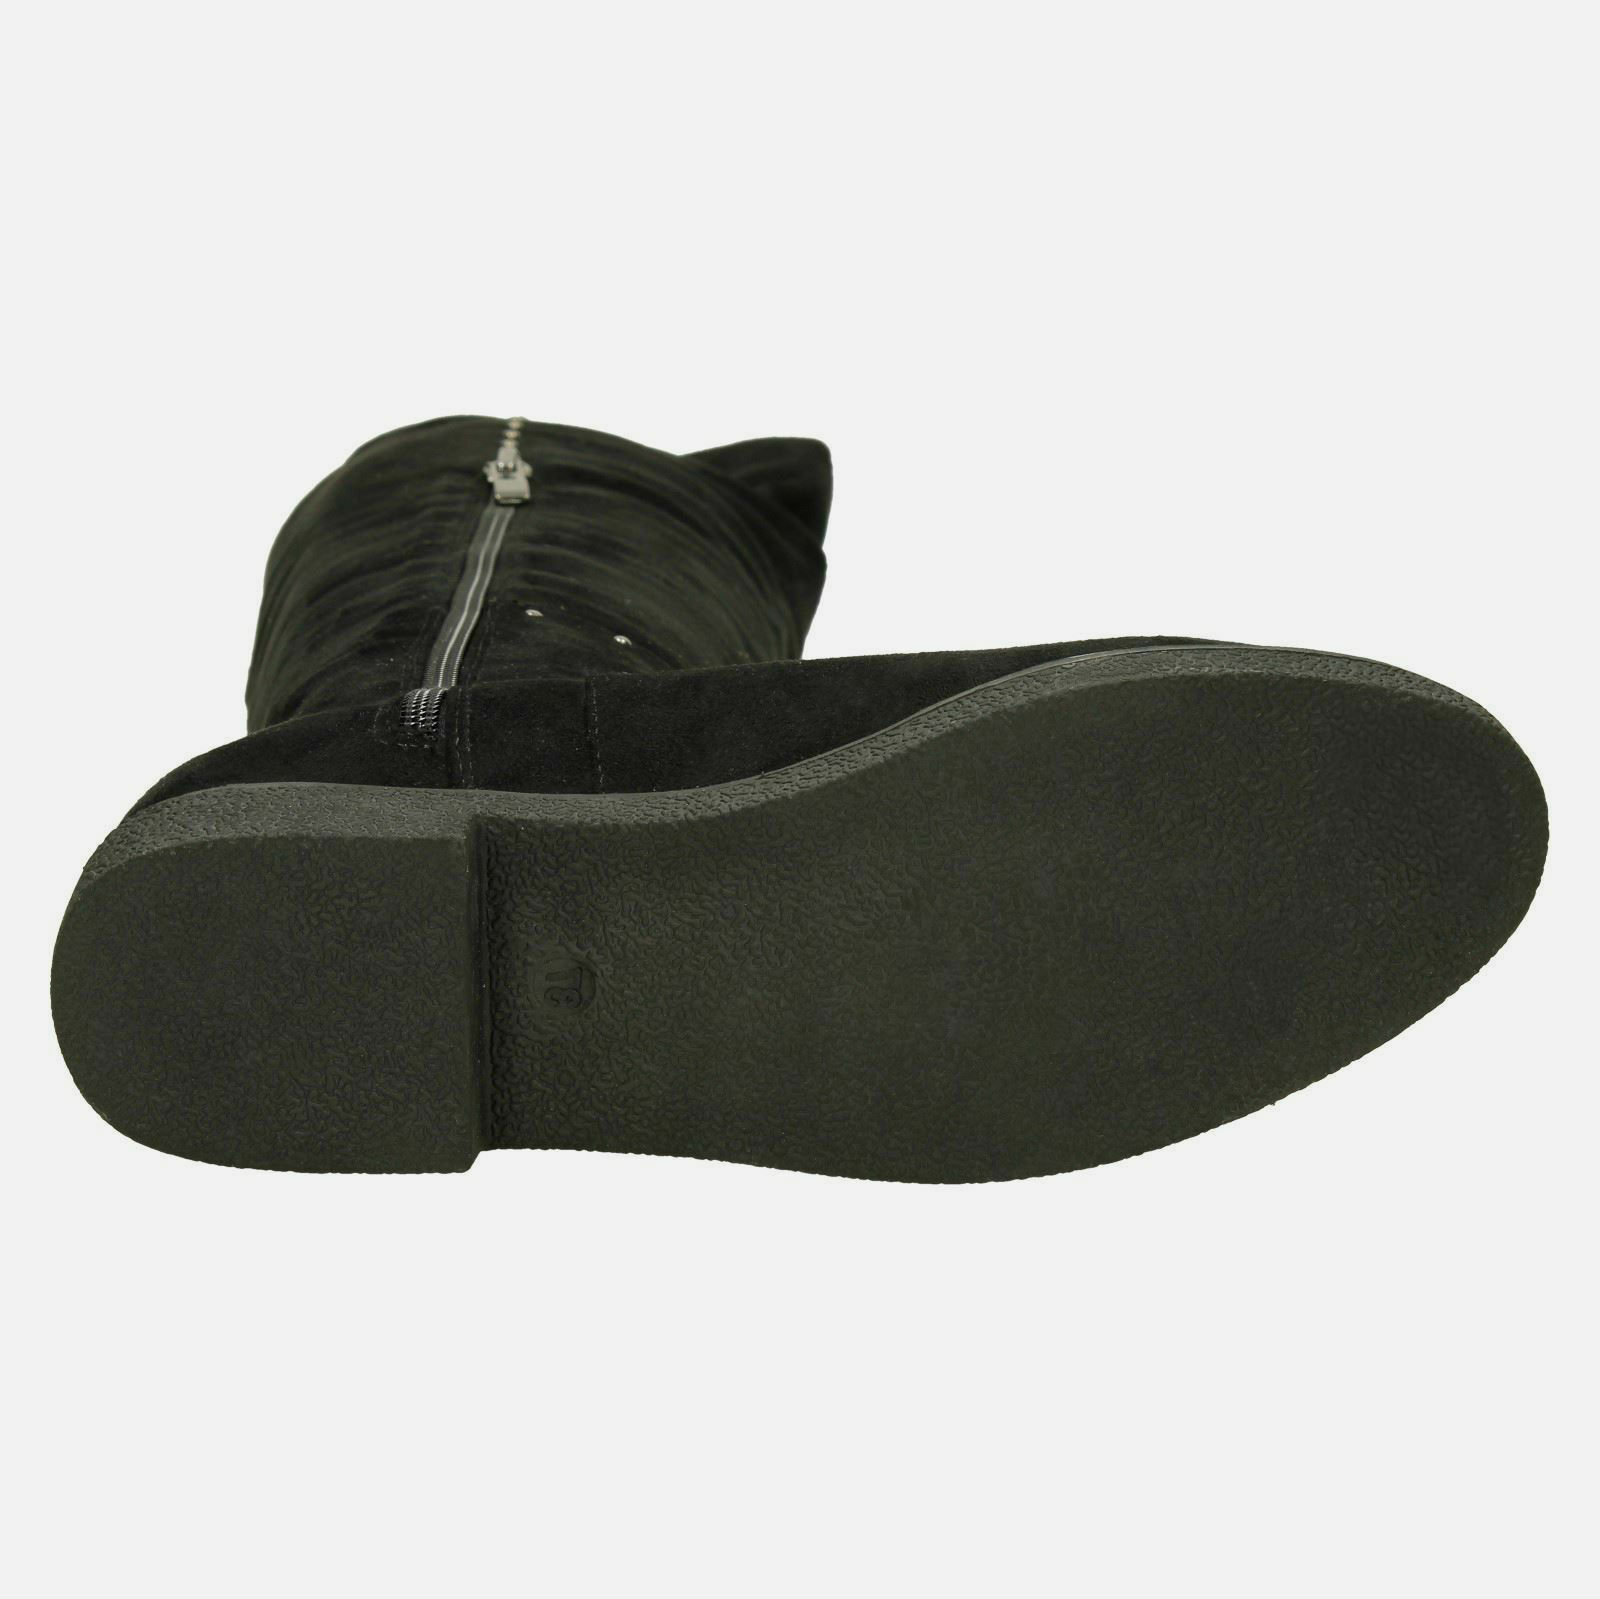 SPOT MICROFIBRE ON LADIES KNEE HIGH LONG PLAIN BLACK MICROFIBRE SPOT ZIP STUDDED BOOTS F50851 8ce455